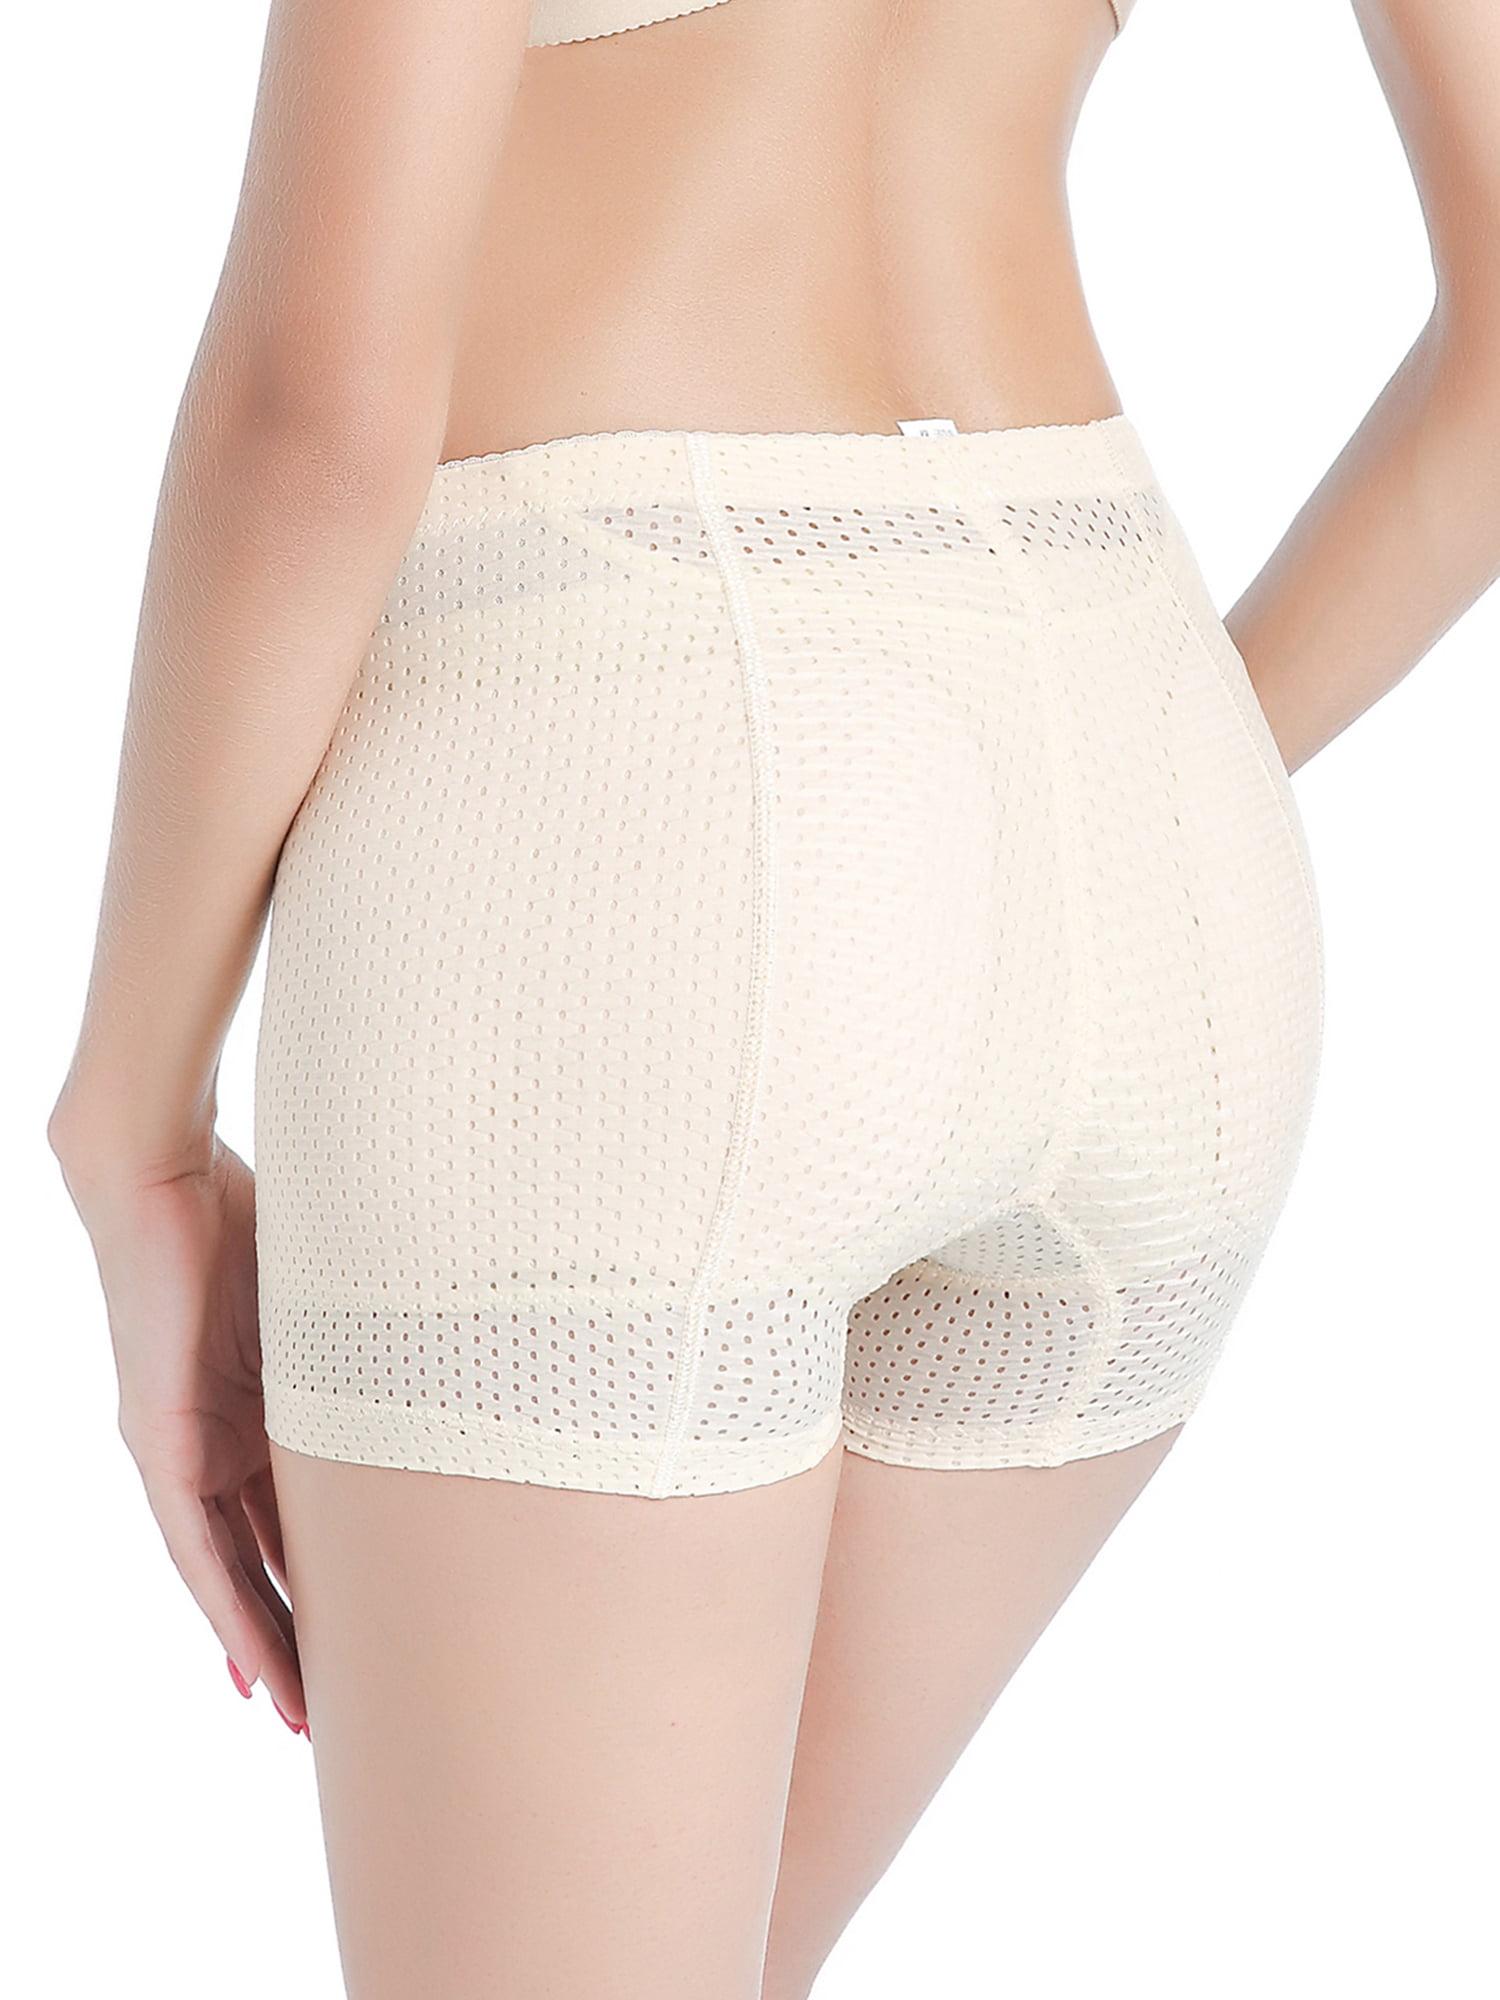 b31e5fcc21 Lelinta - LELINTA Women s Seamless Butt Lifter Padded Panties Enhancer Hip  Slimming Underwear Body Shaper BoyShorts - Walmart.com